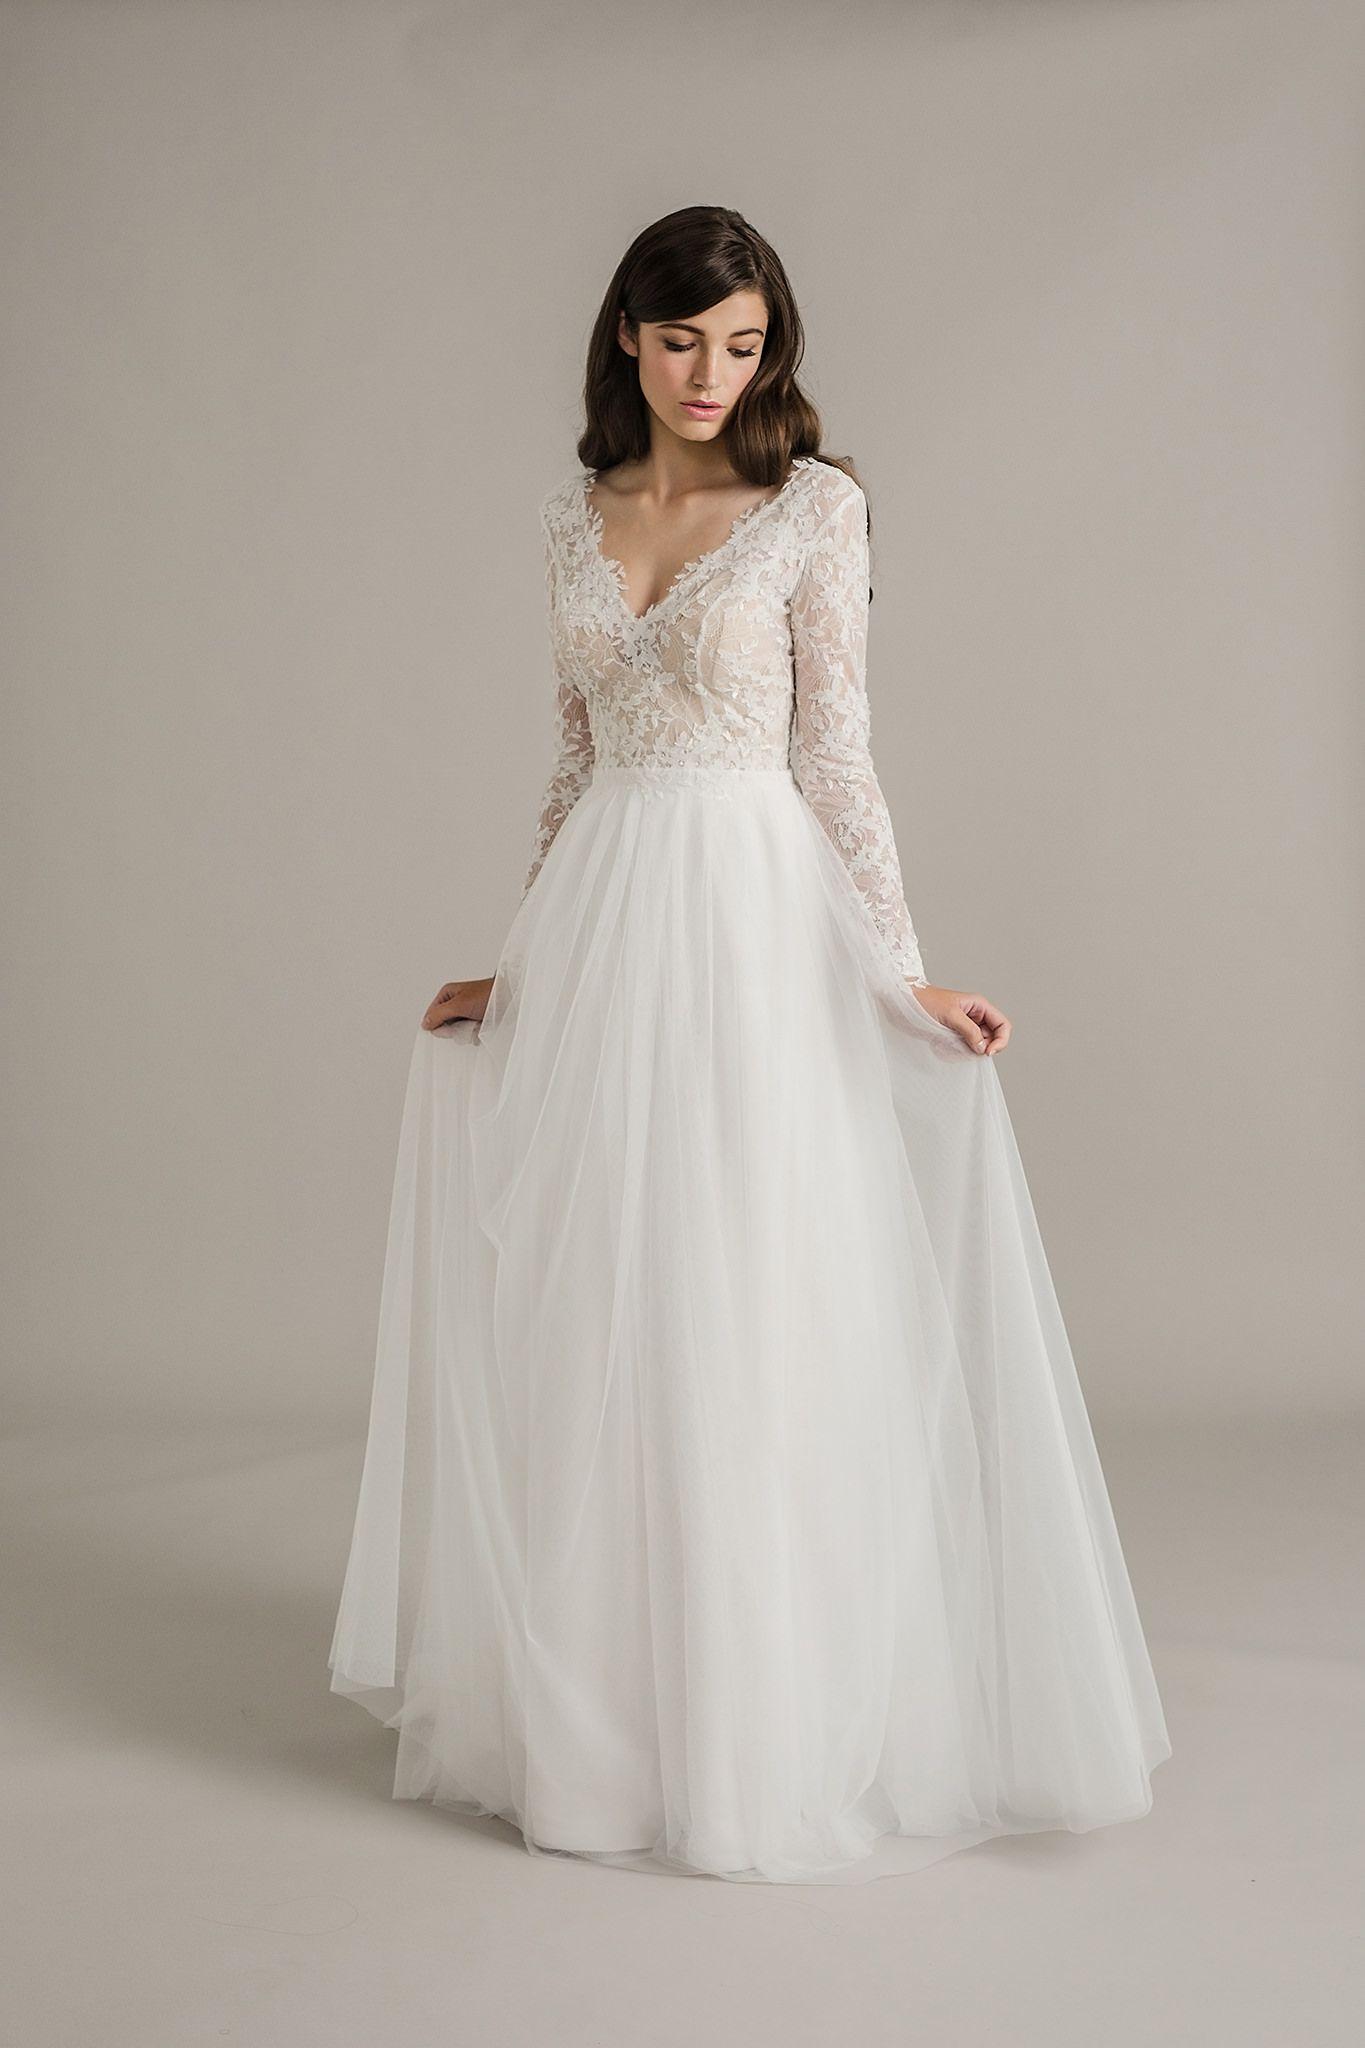 Sally eagle wedding dress collection dusk dress pinterest